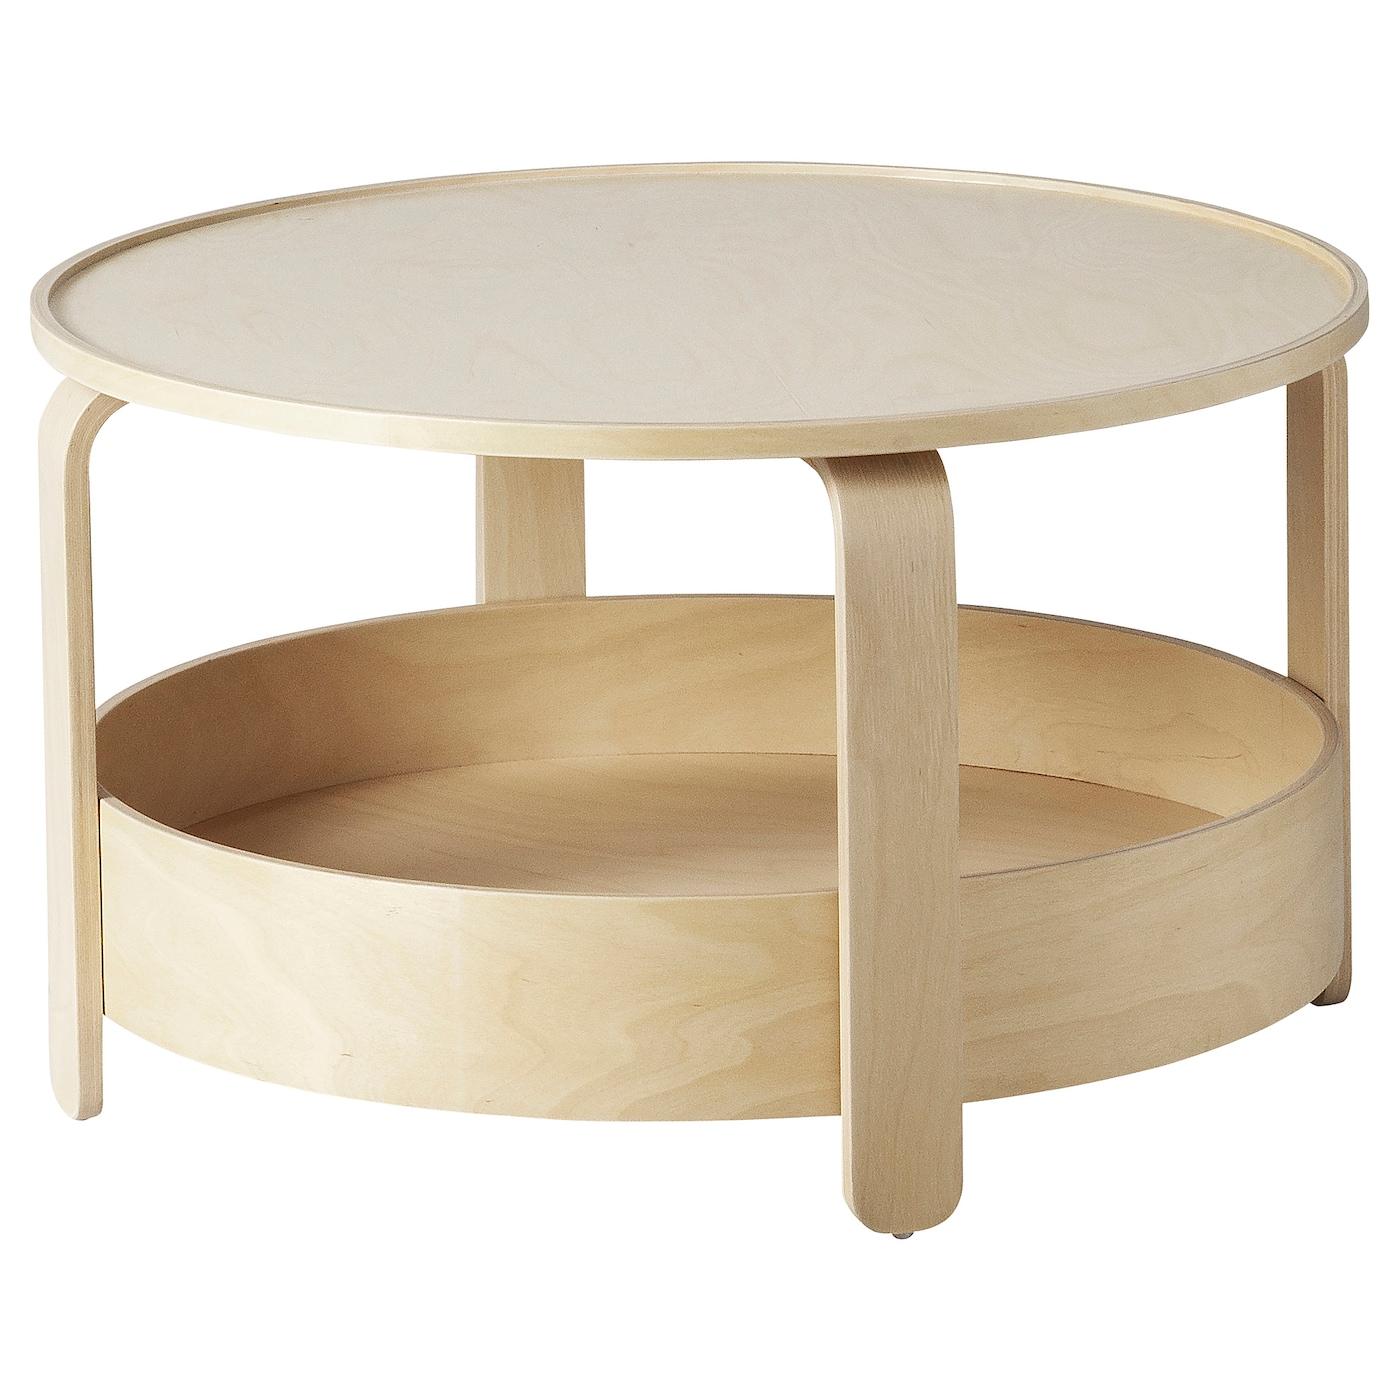 Borgeby Coffee Table Birch Veneer 70 Cm Ikea Ireland [ 1400 x 1400 Pixel ]